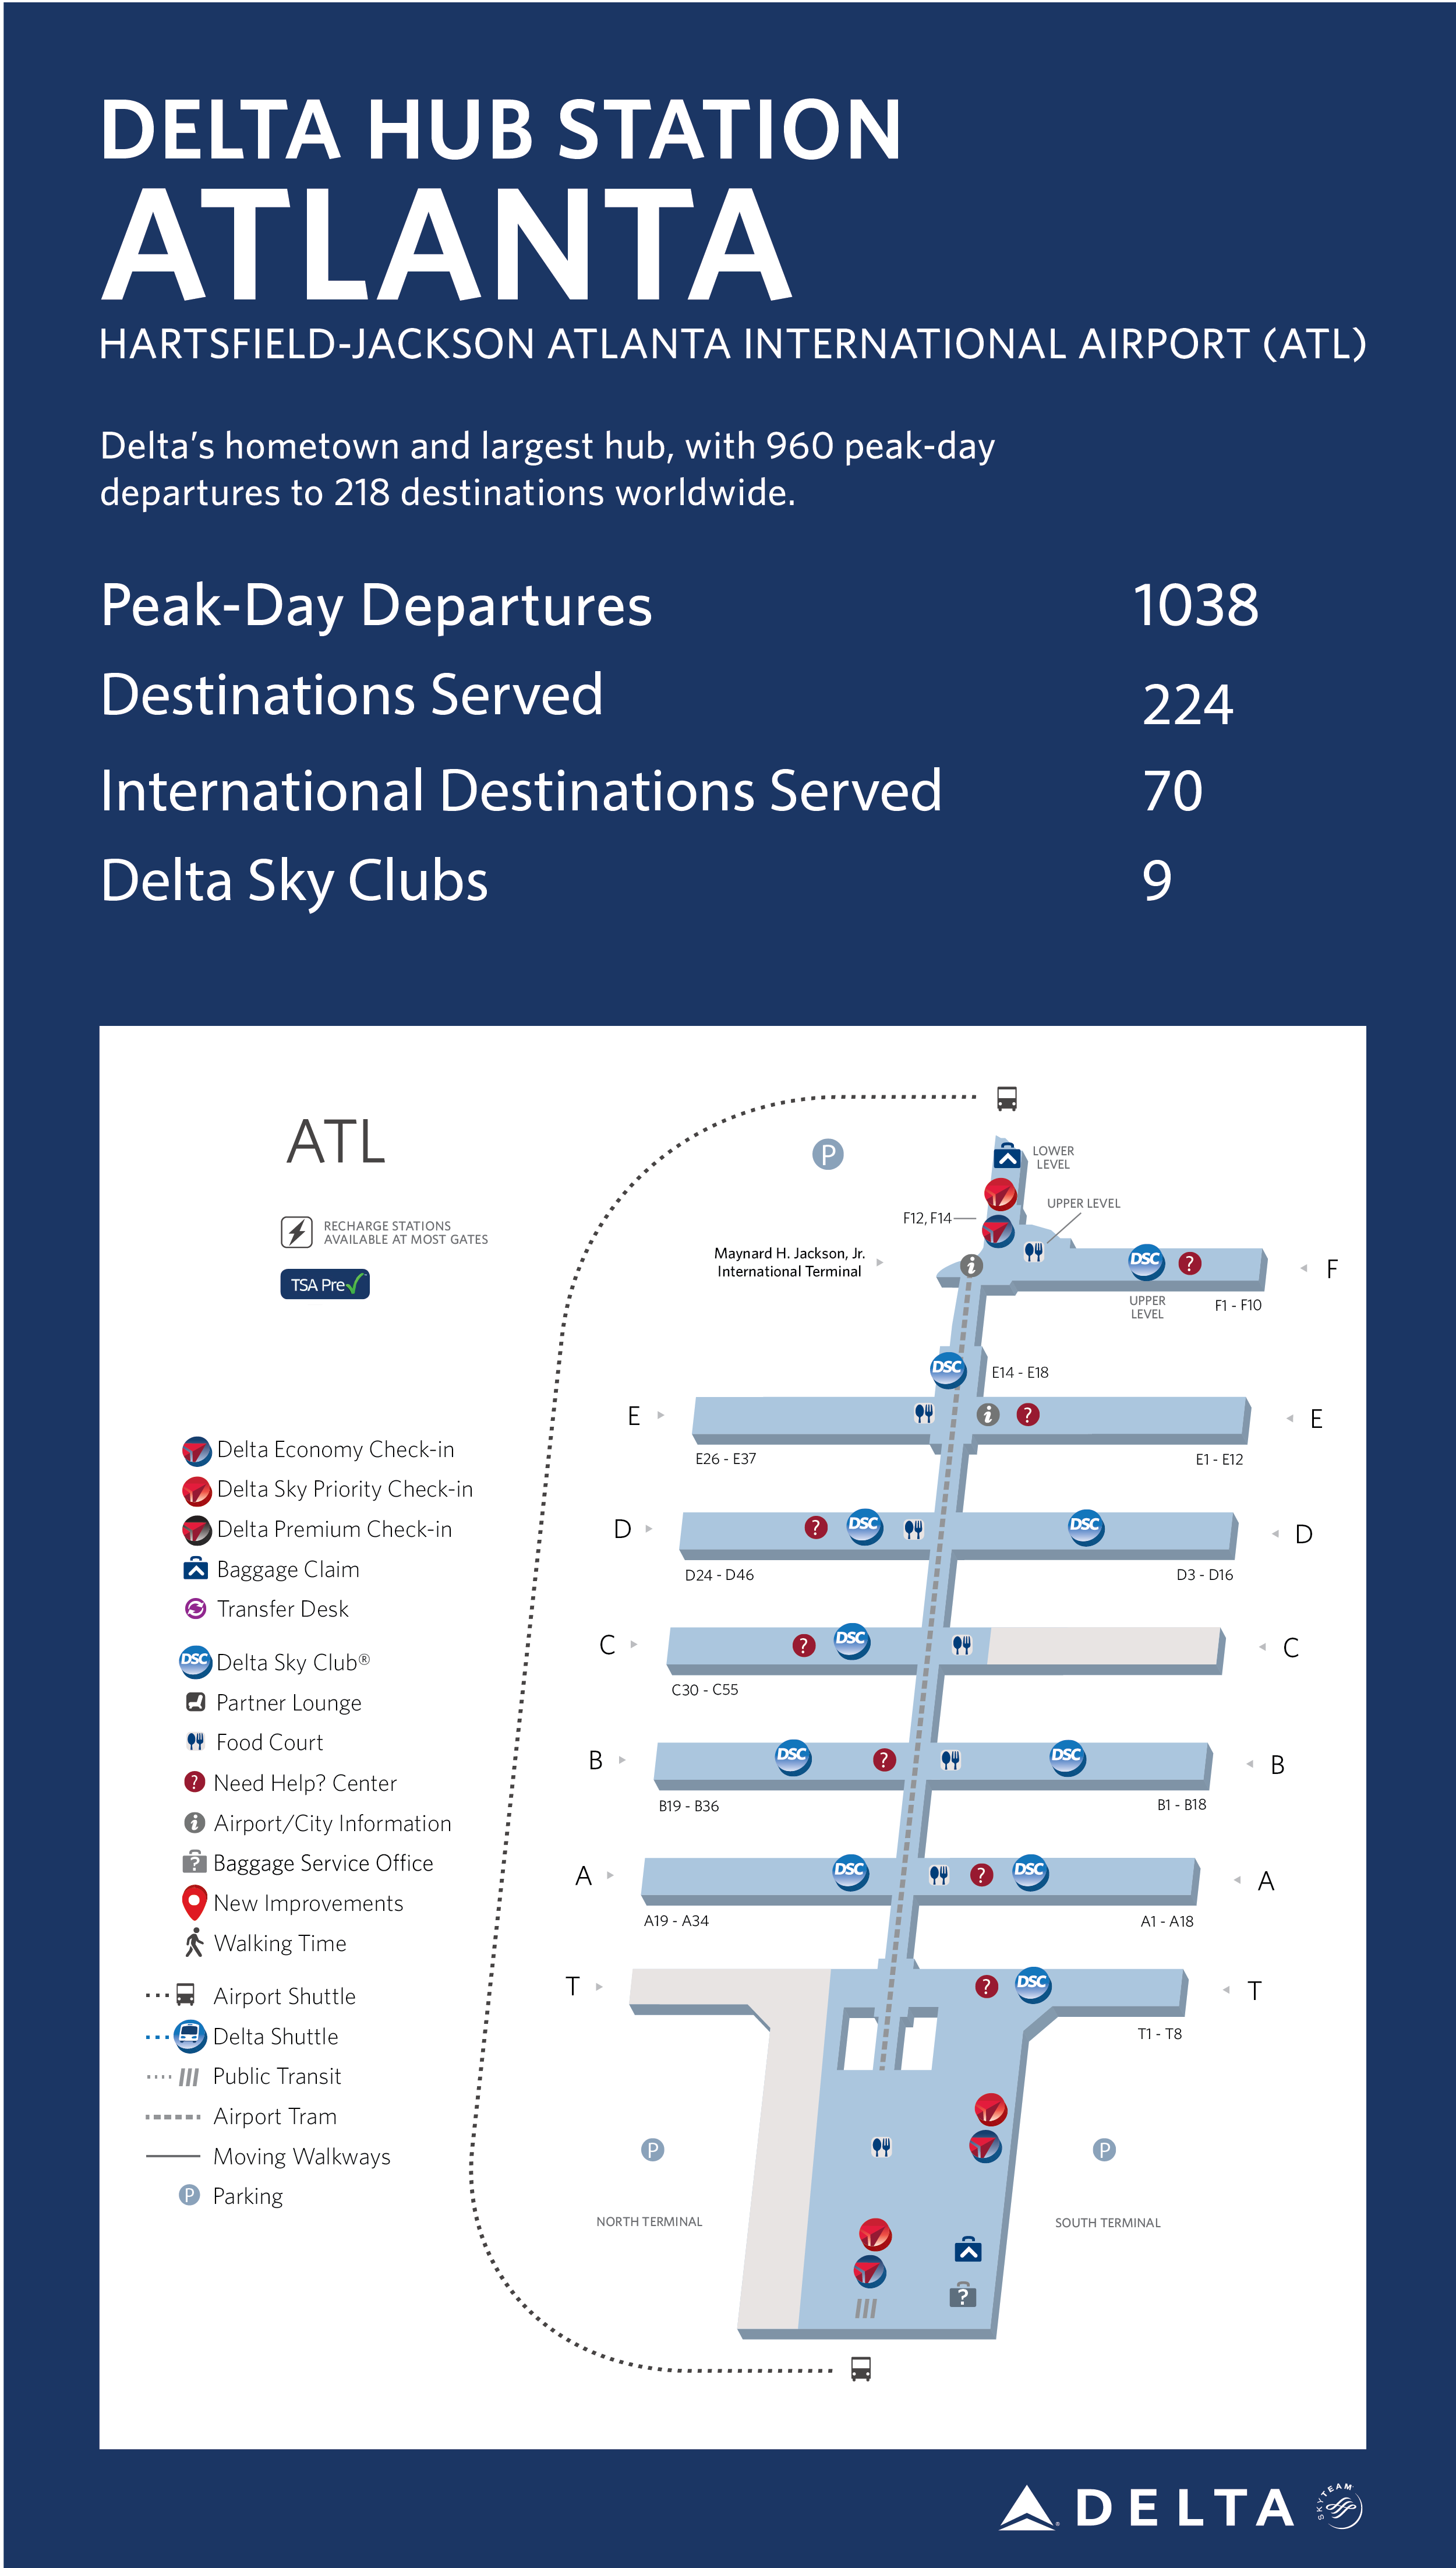 Atlanta Hub Station Fact Sheet